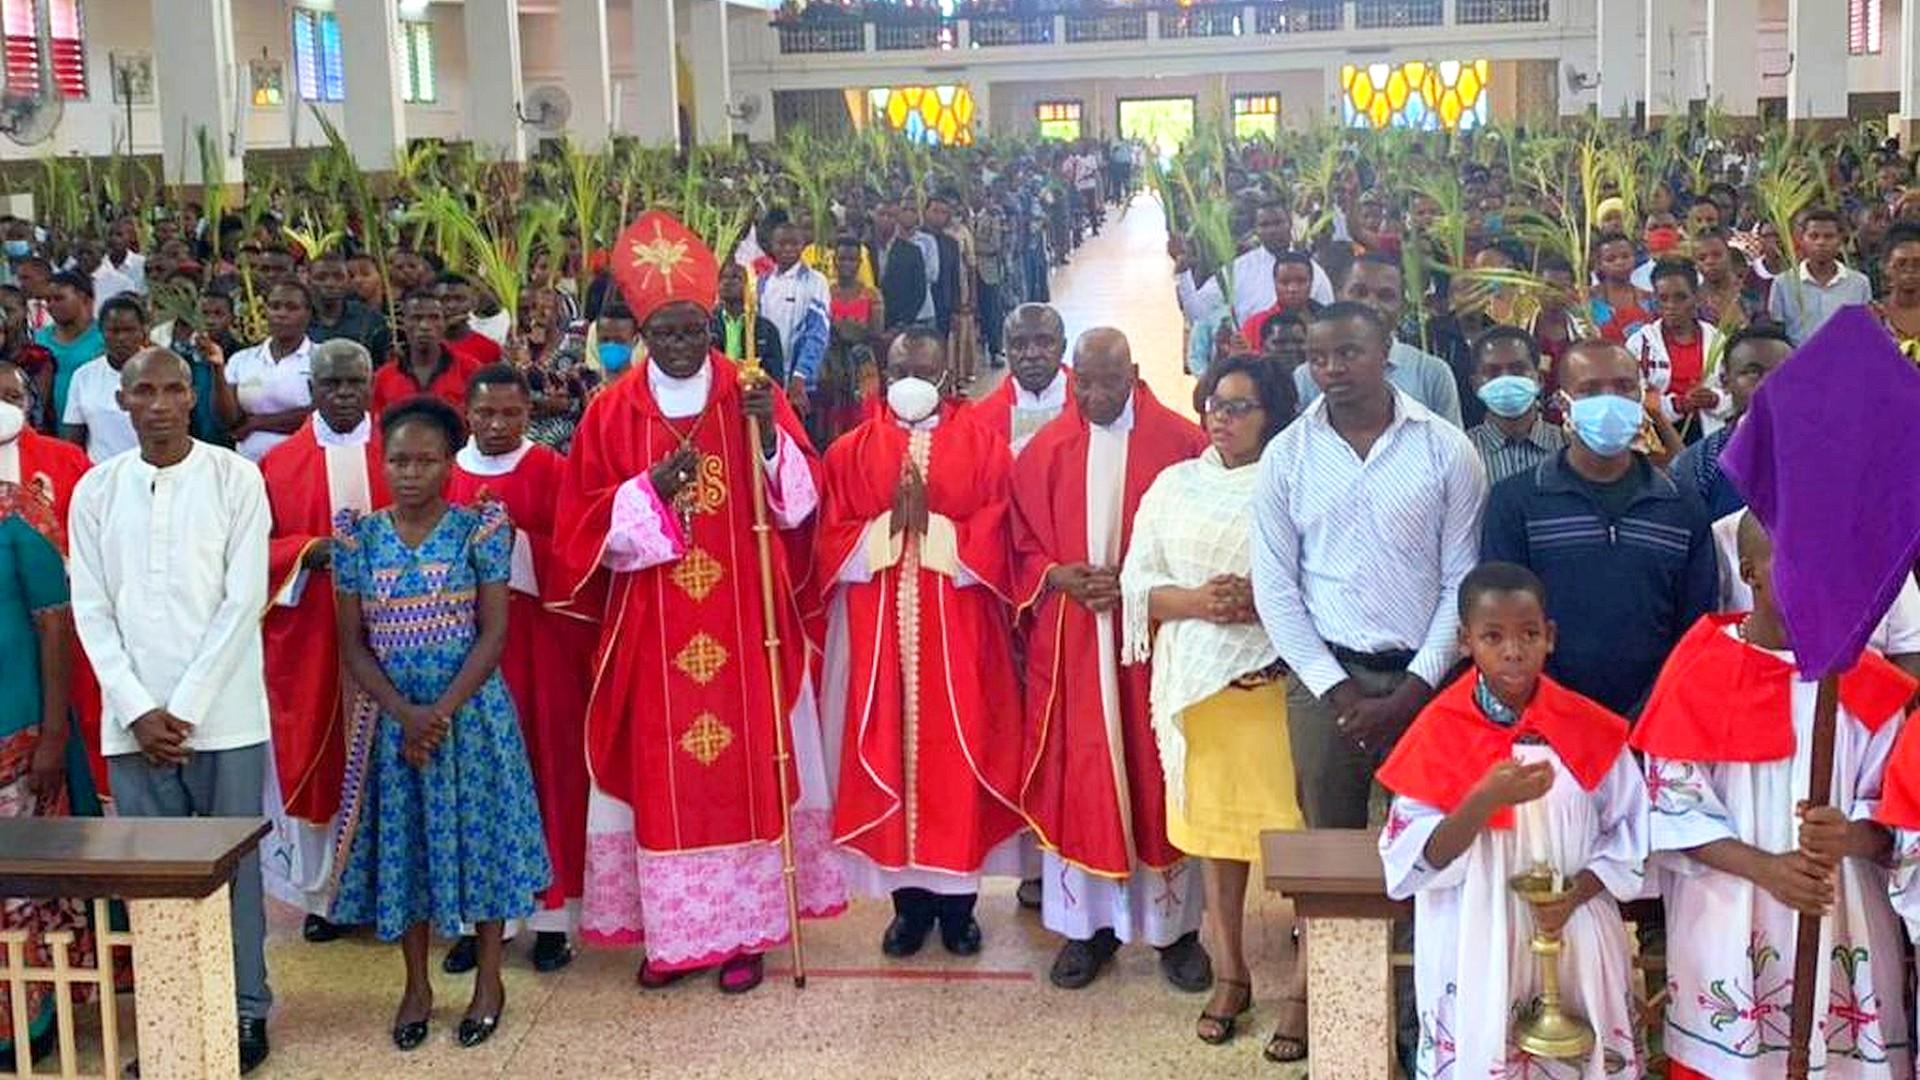 Palmsonntag Messe mit Pater Aidan in Moshi